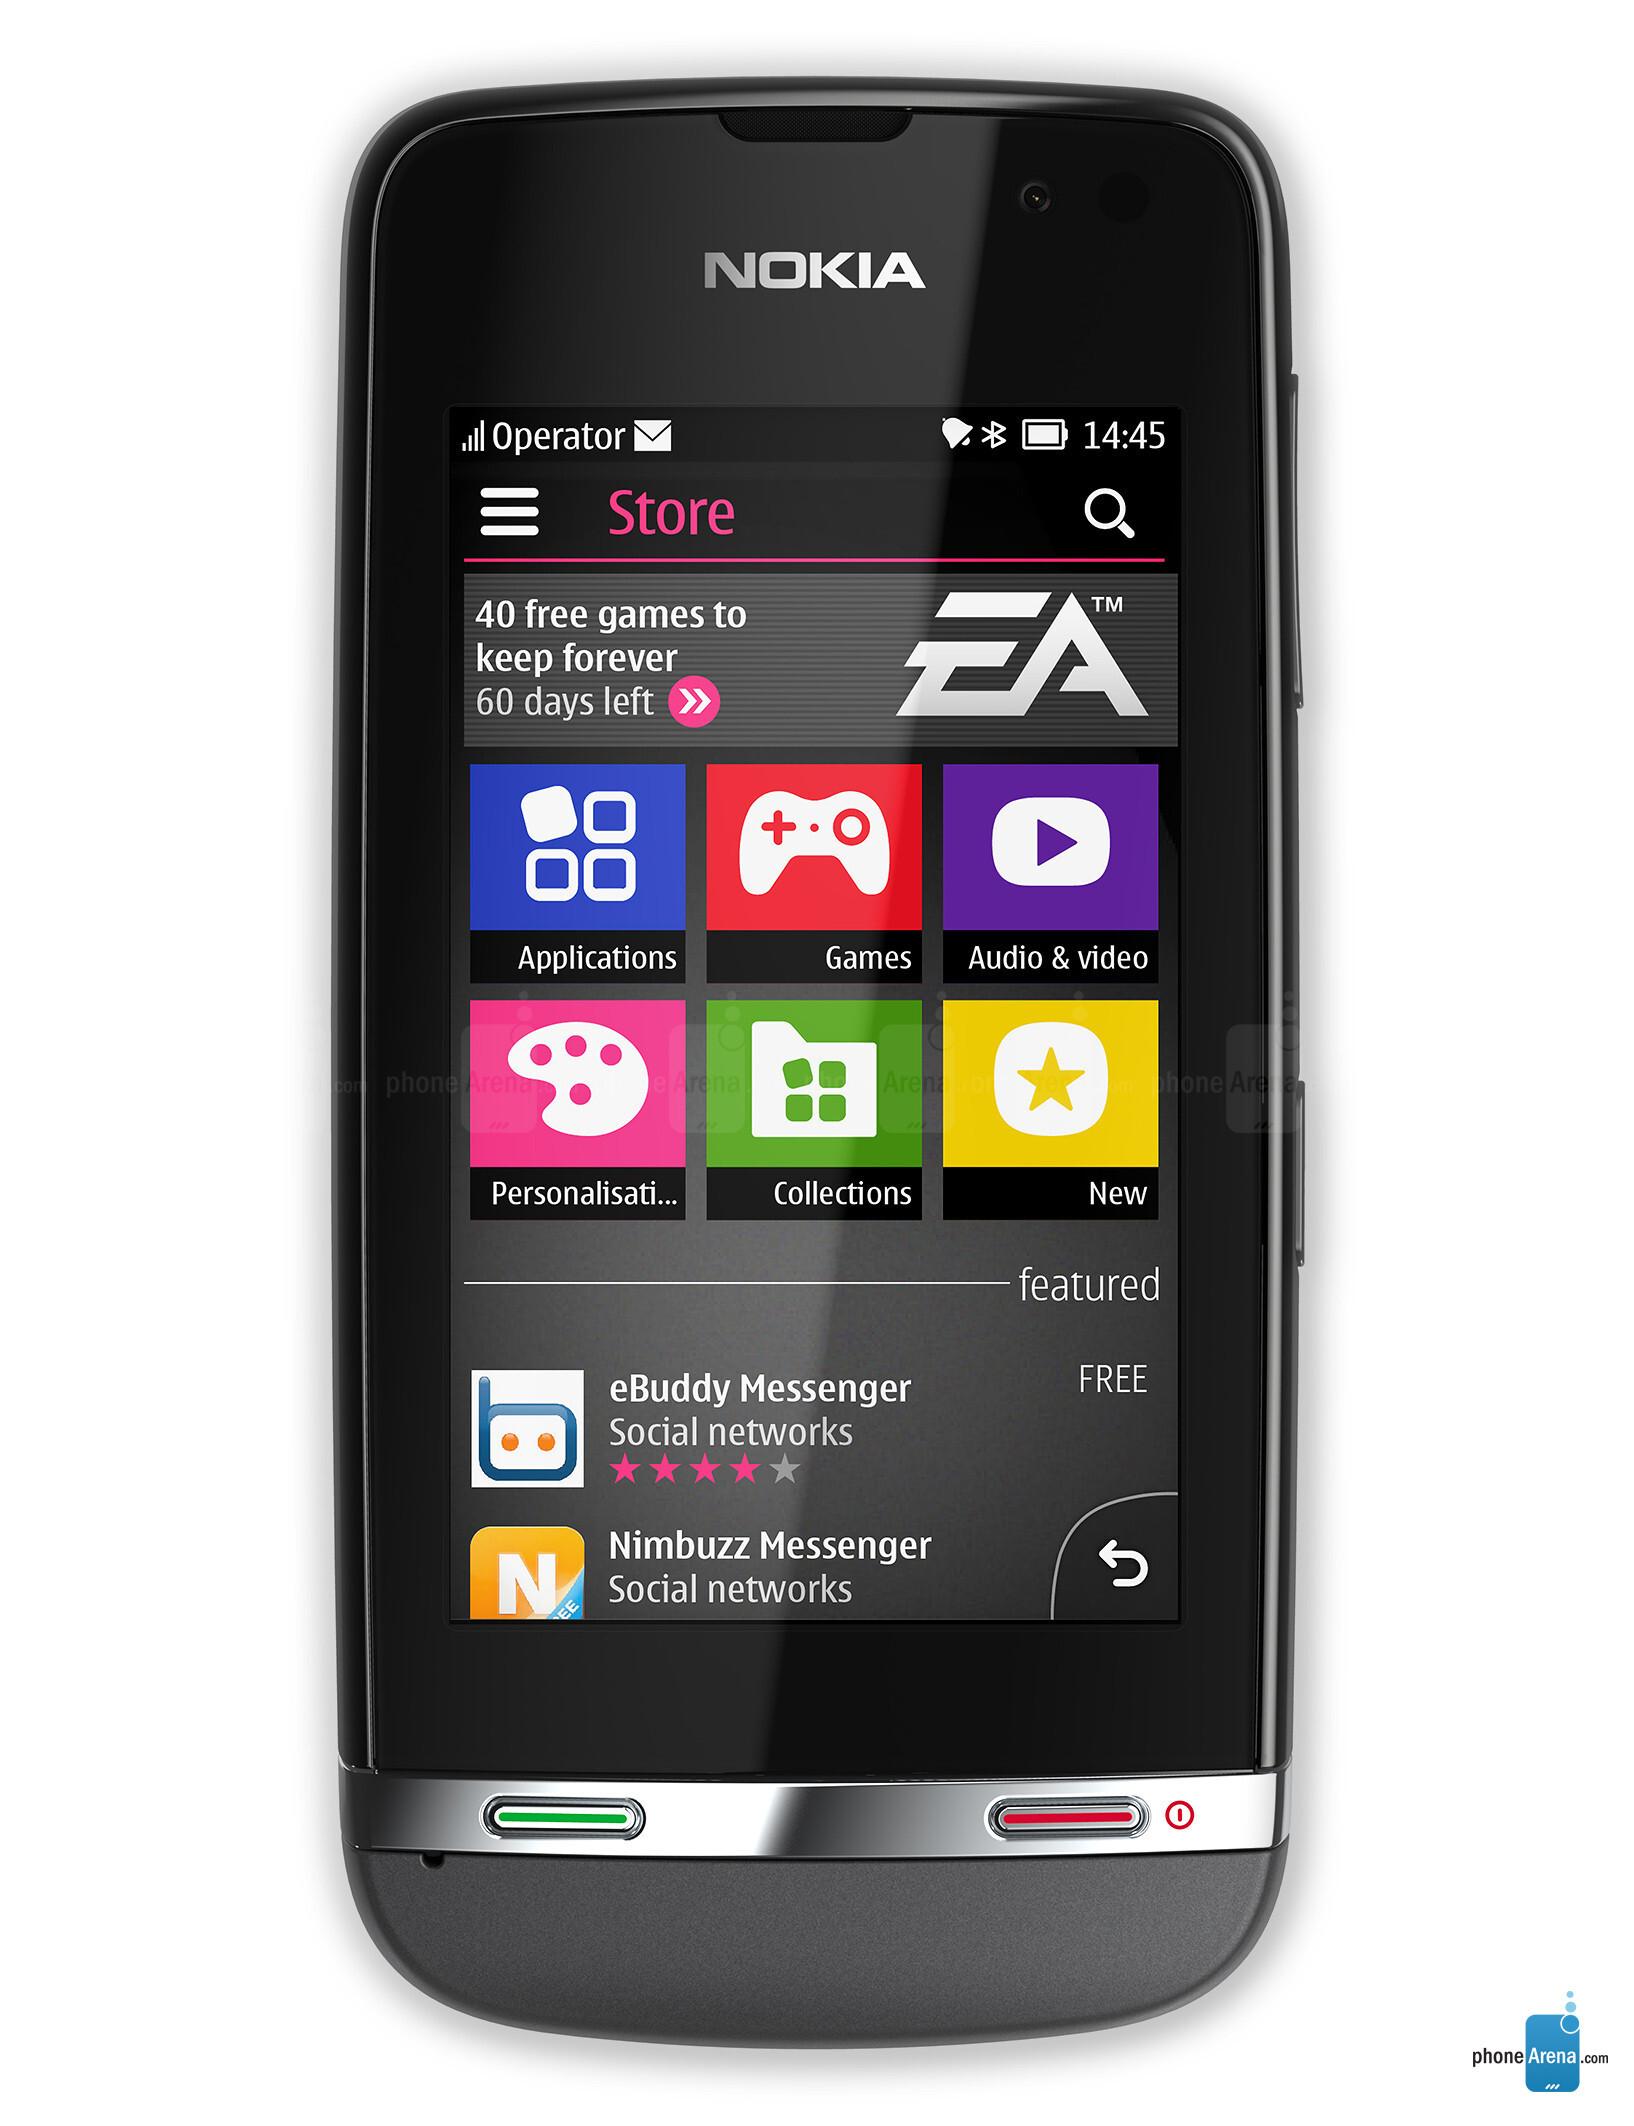 nokia asha 311 specs Verizon LG Phone Manual Samsung Phone Manuals